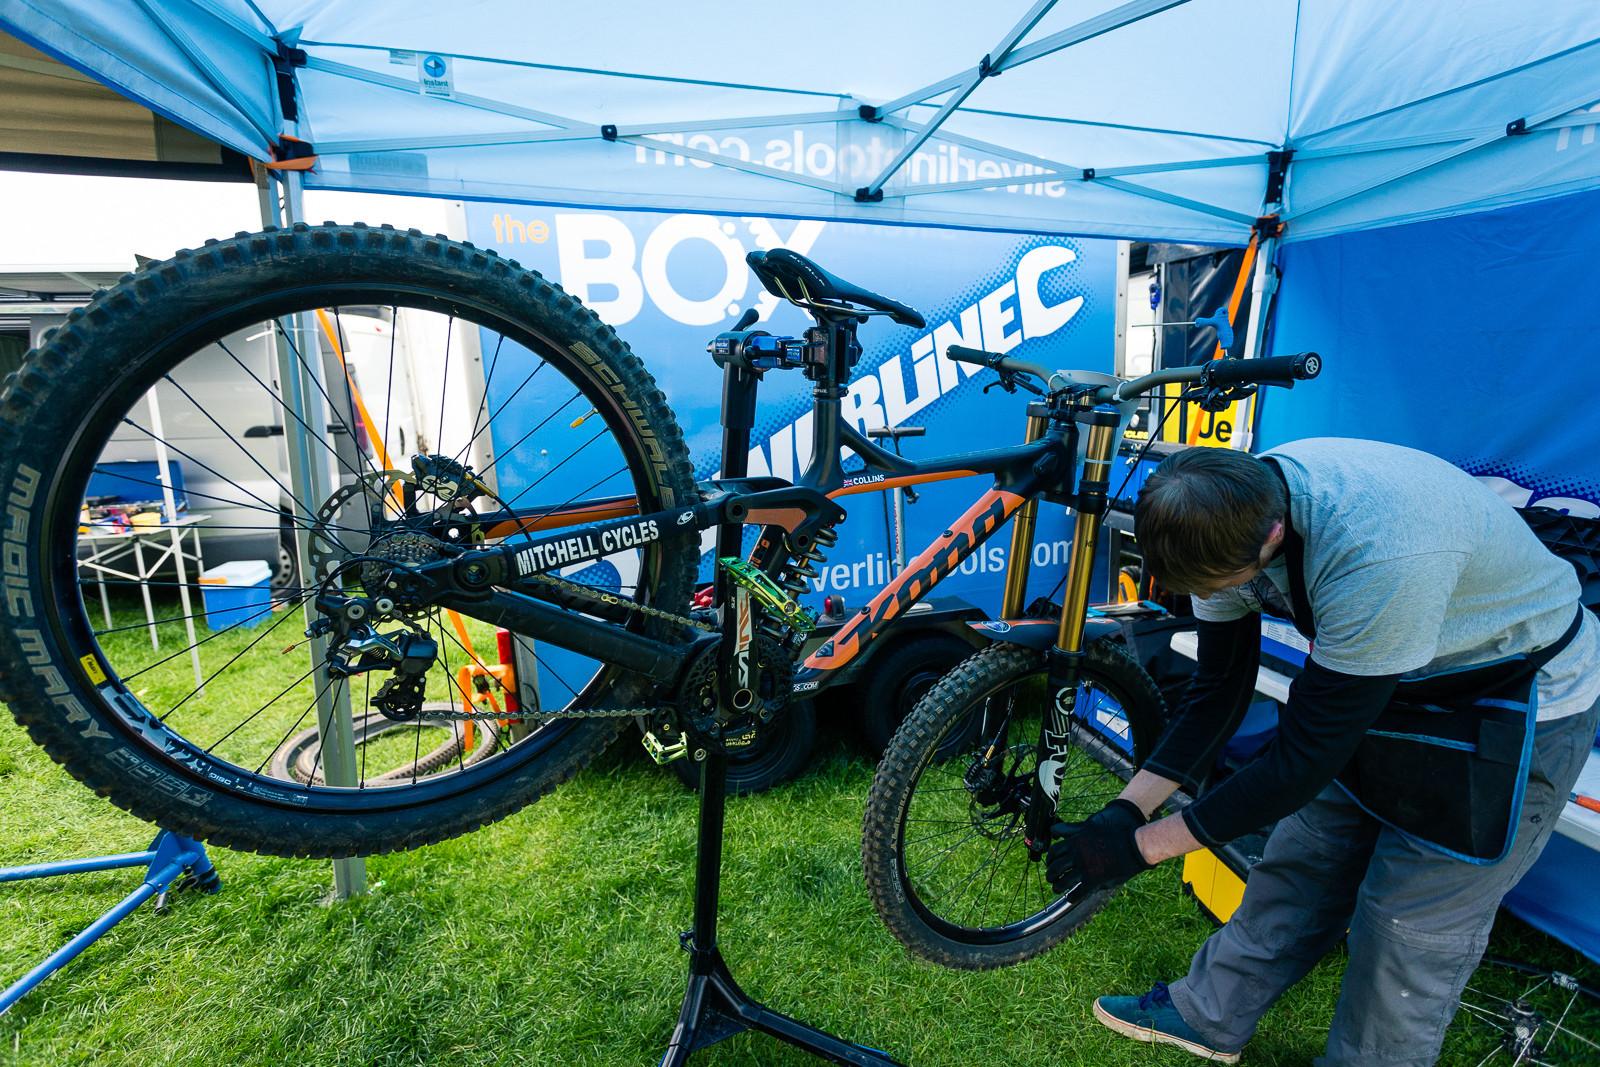 Kona Supreme Operator, BDS Llangollen - PIT BITS - British Downhill Series, Llangollen - Mountain Biking Pictures - Vital MTB